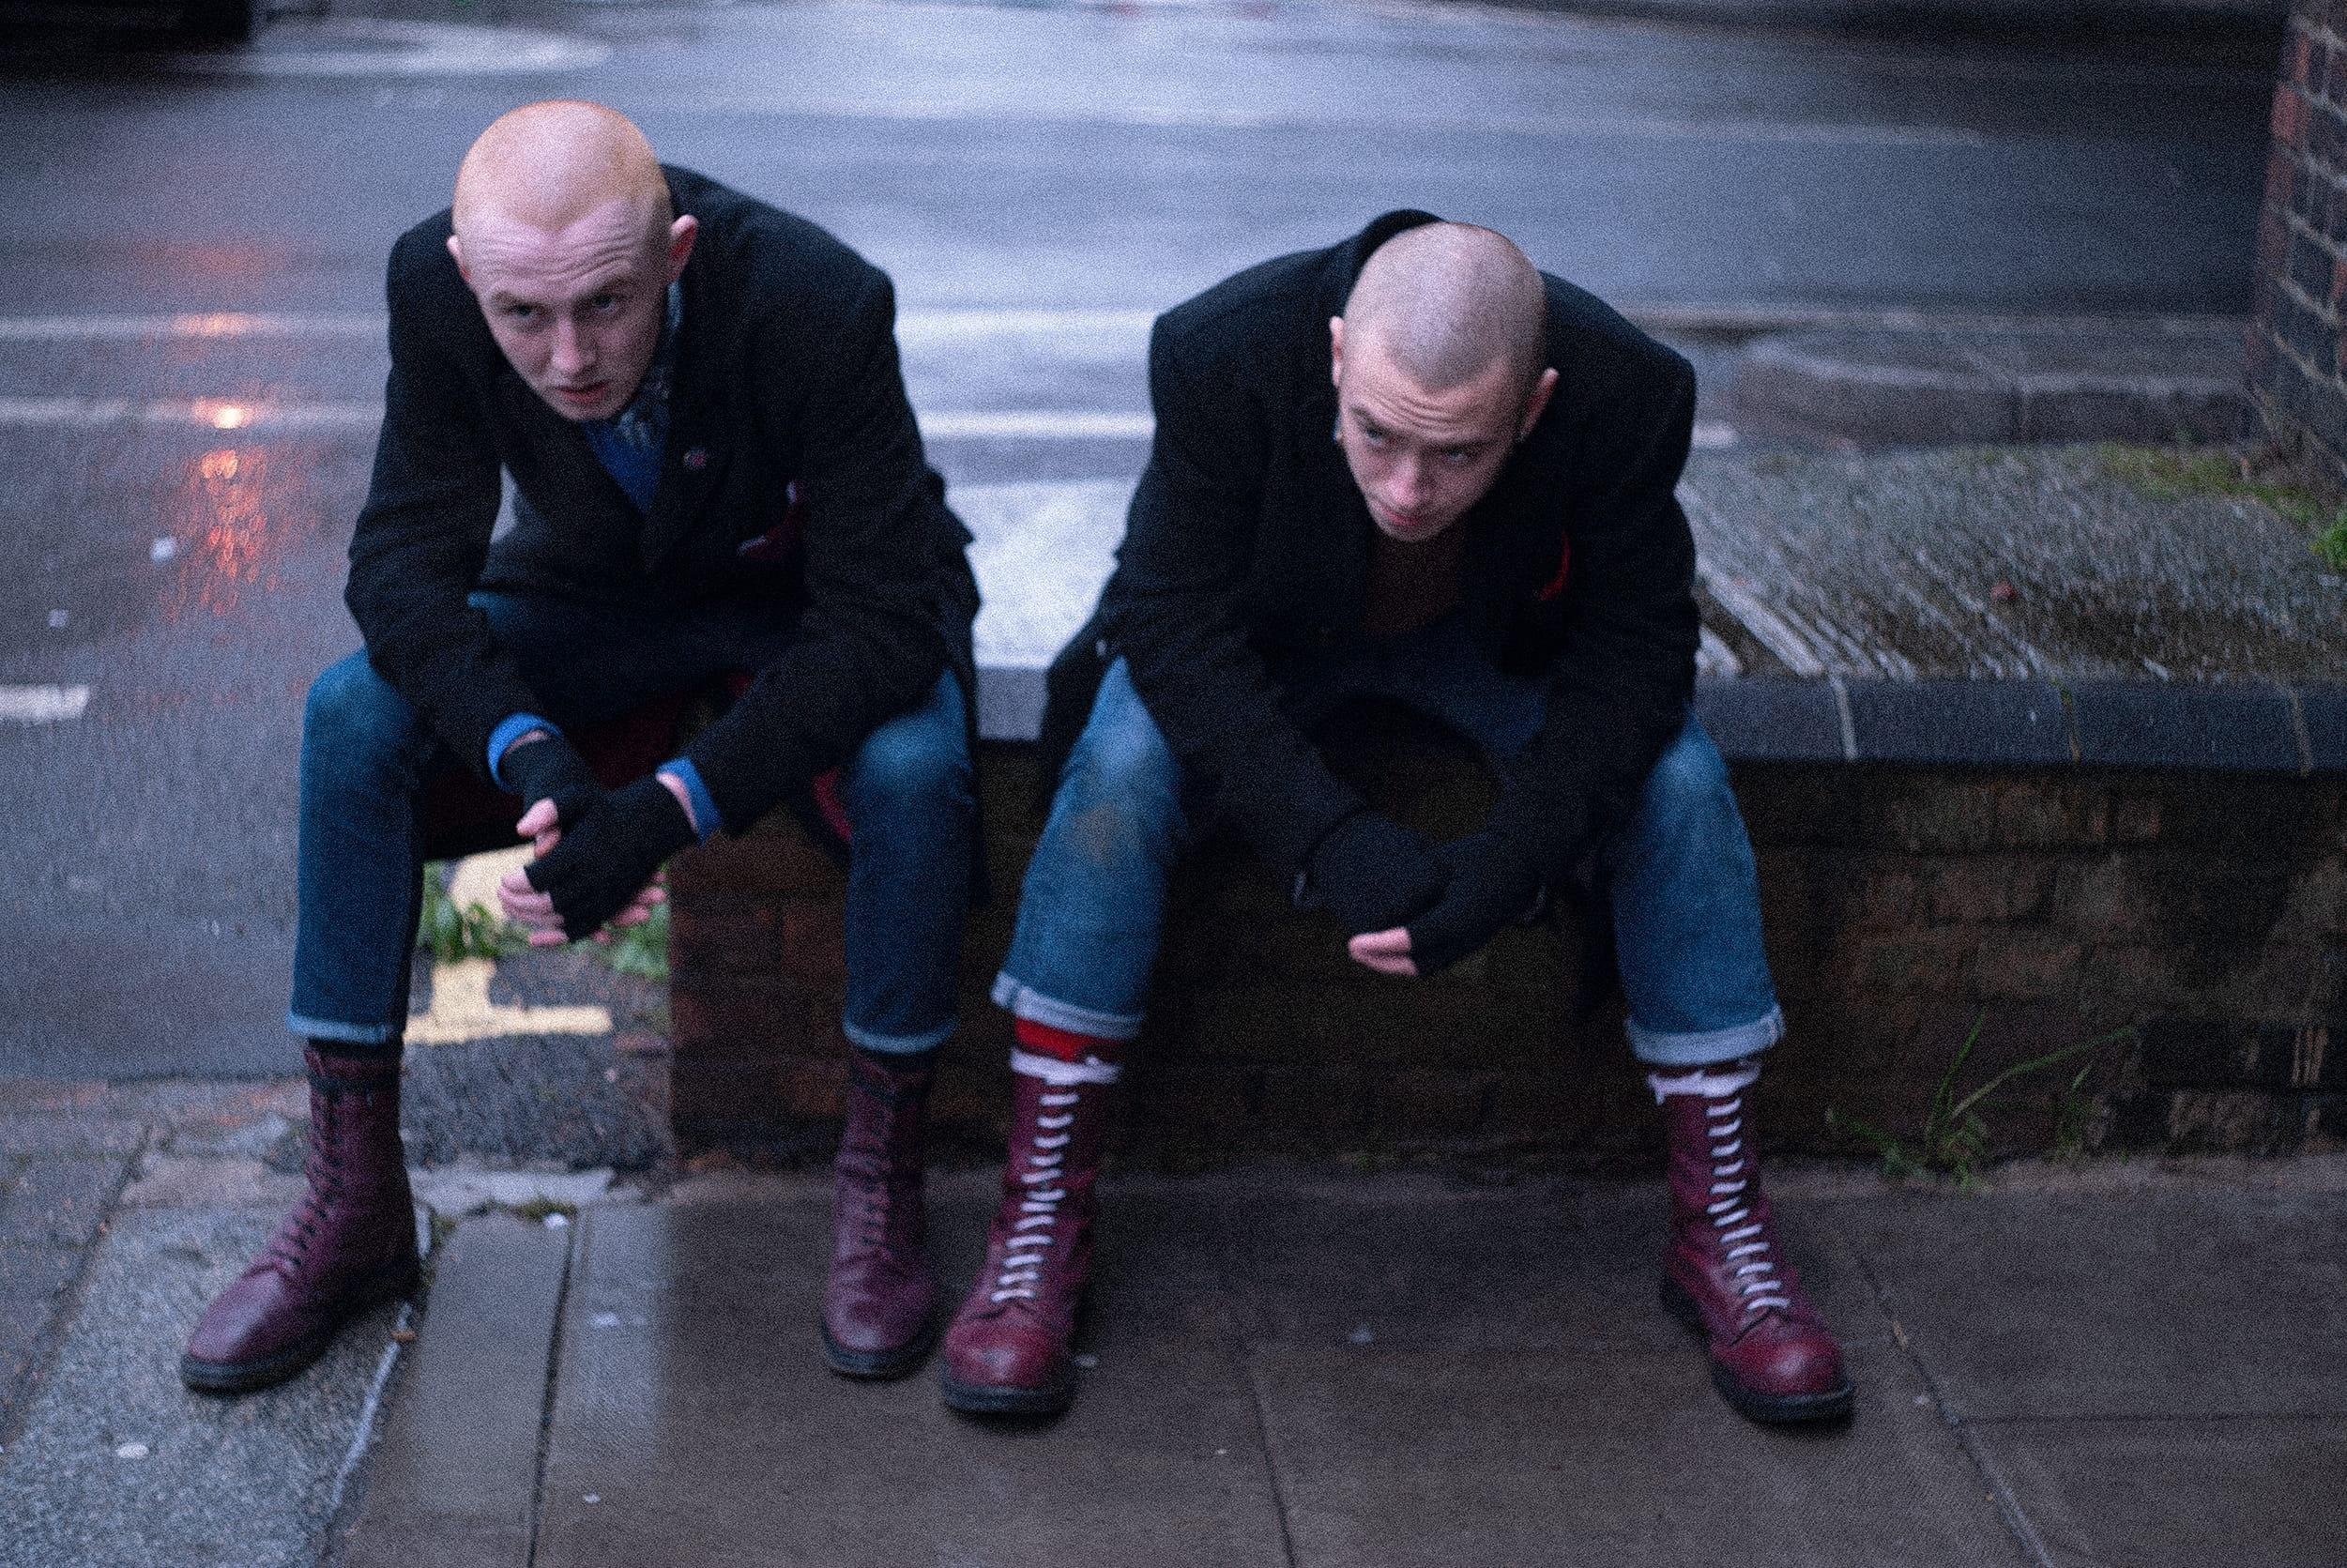 LEZ CREATIVE - Romance of a Skinhead 07